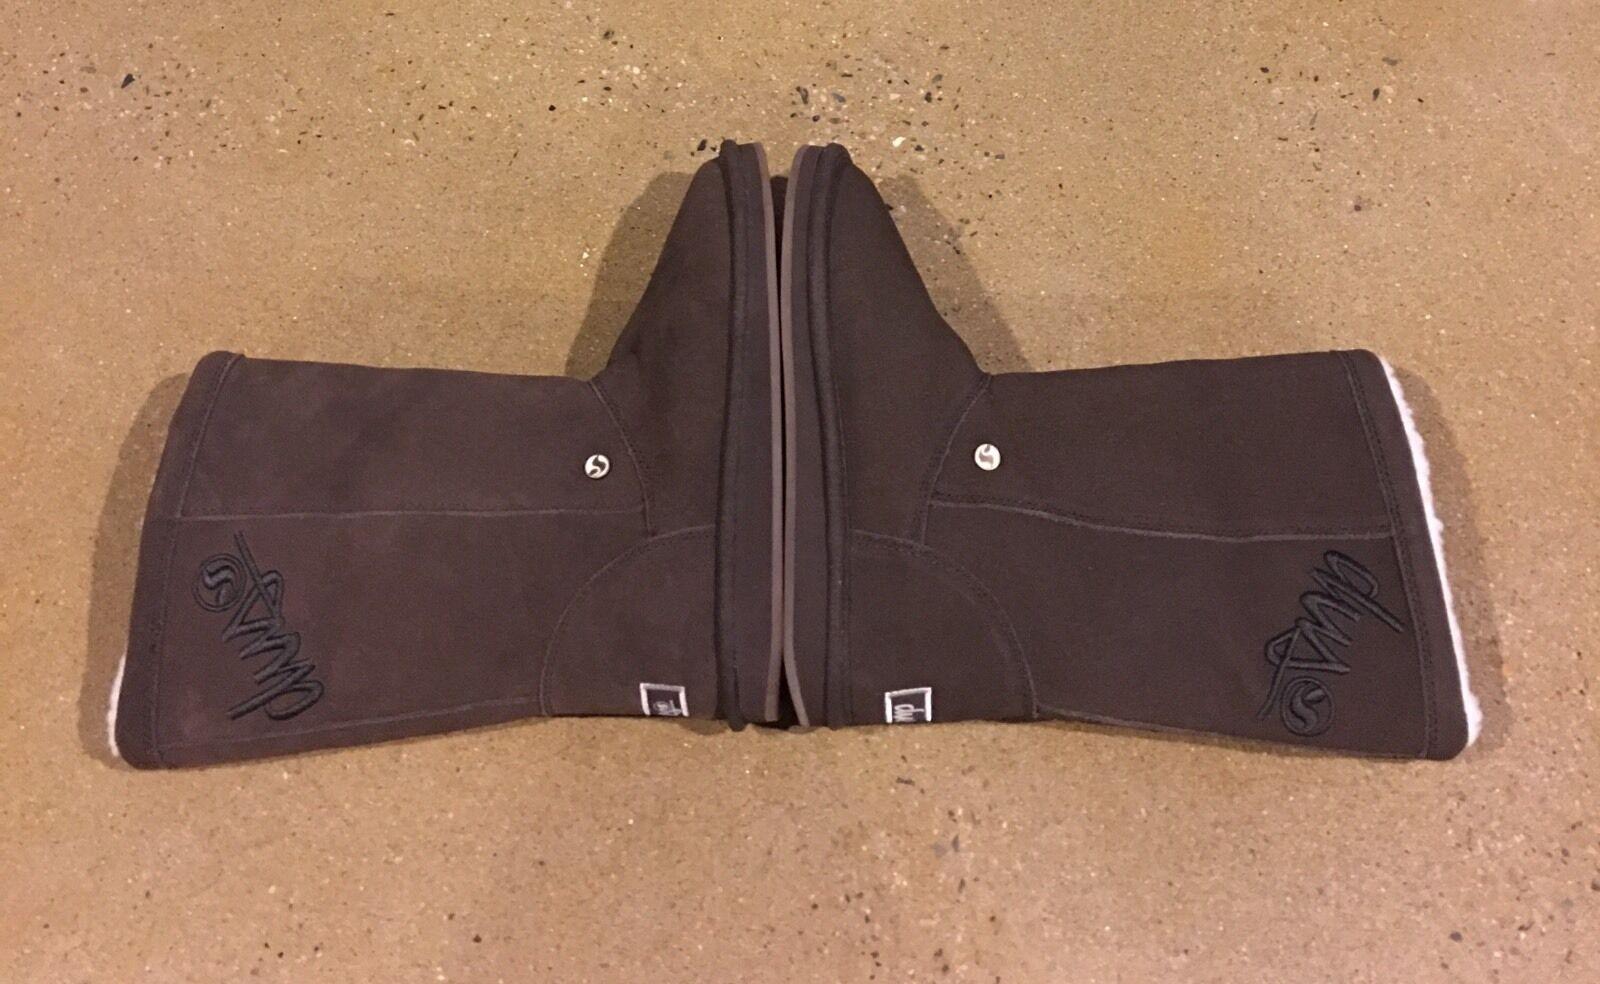 DVS Glacier Woman's Größe 6.5 Cold Grip Technology Snow Winter BMX Skate Stiefel